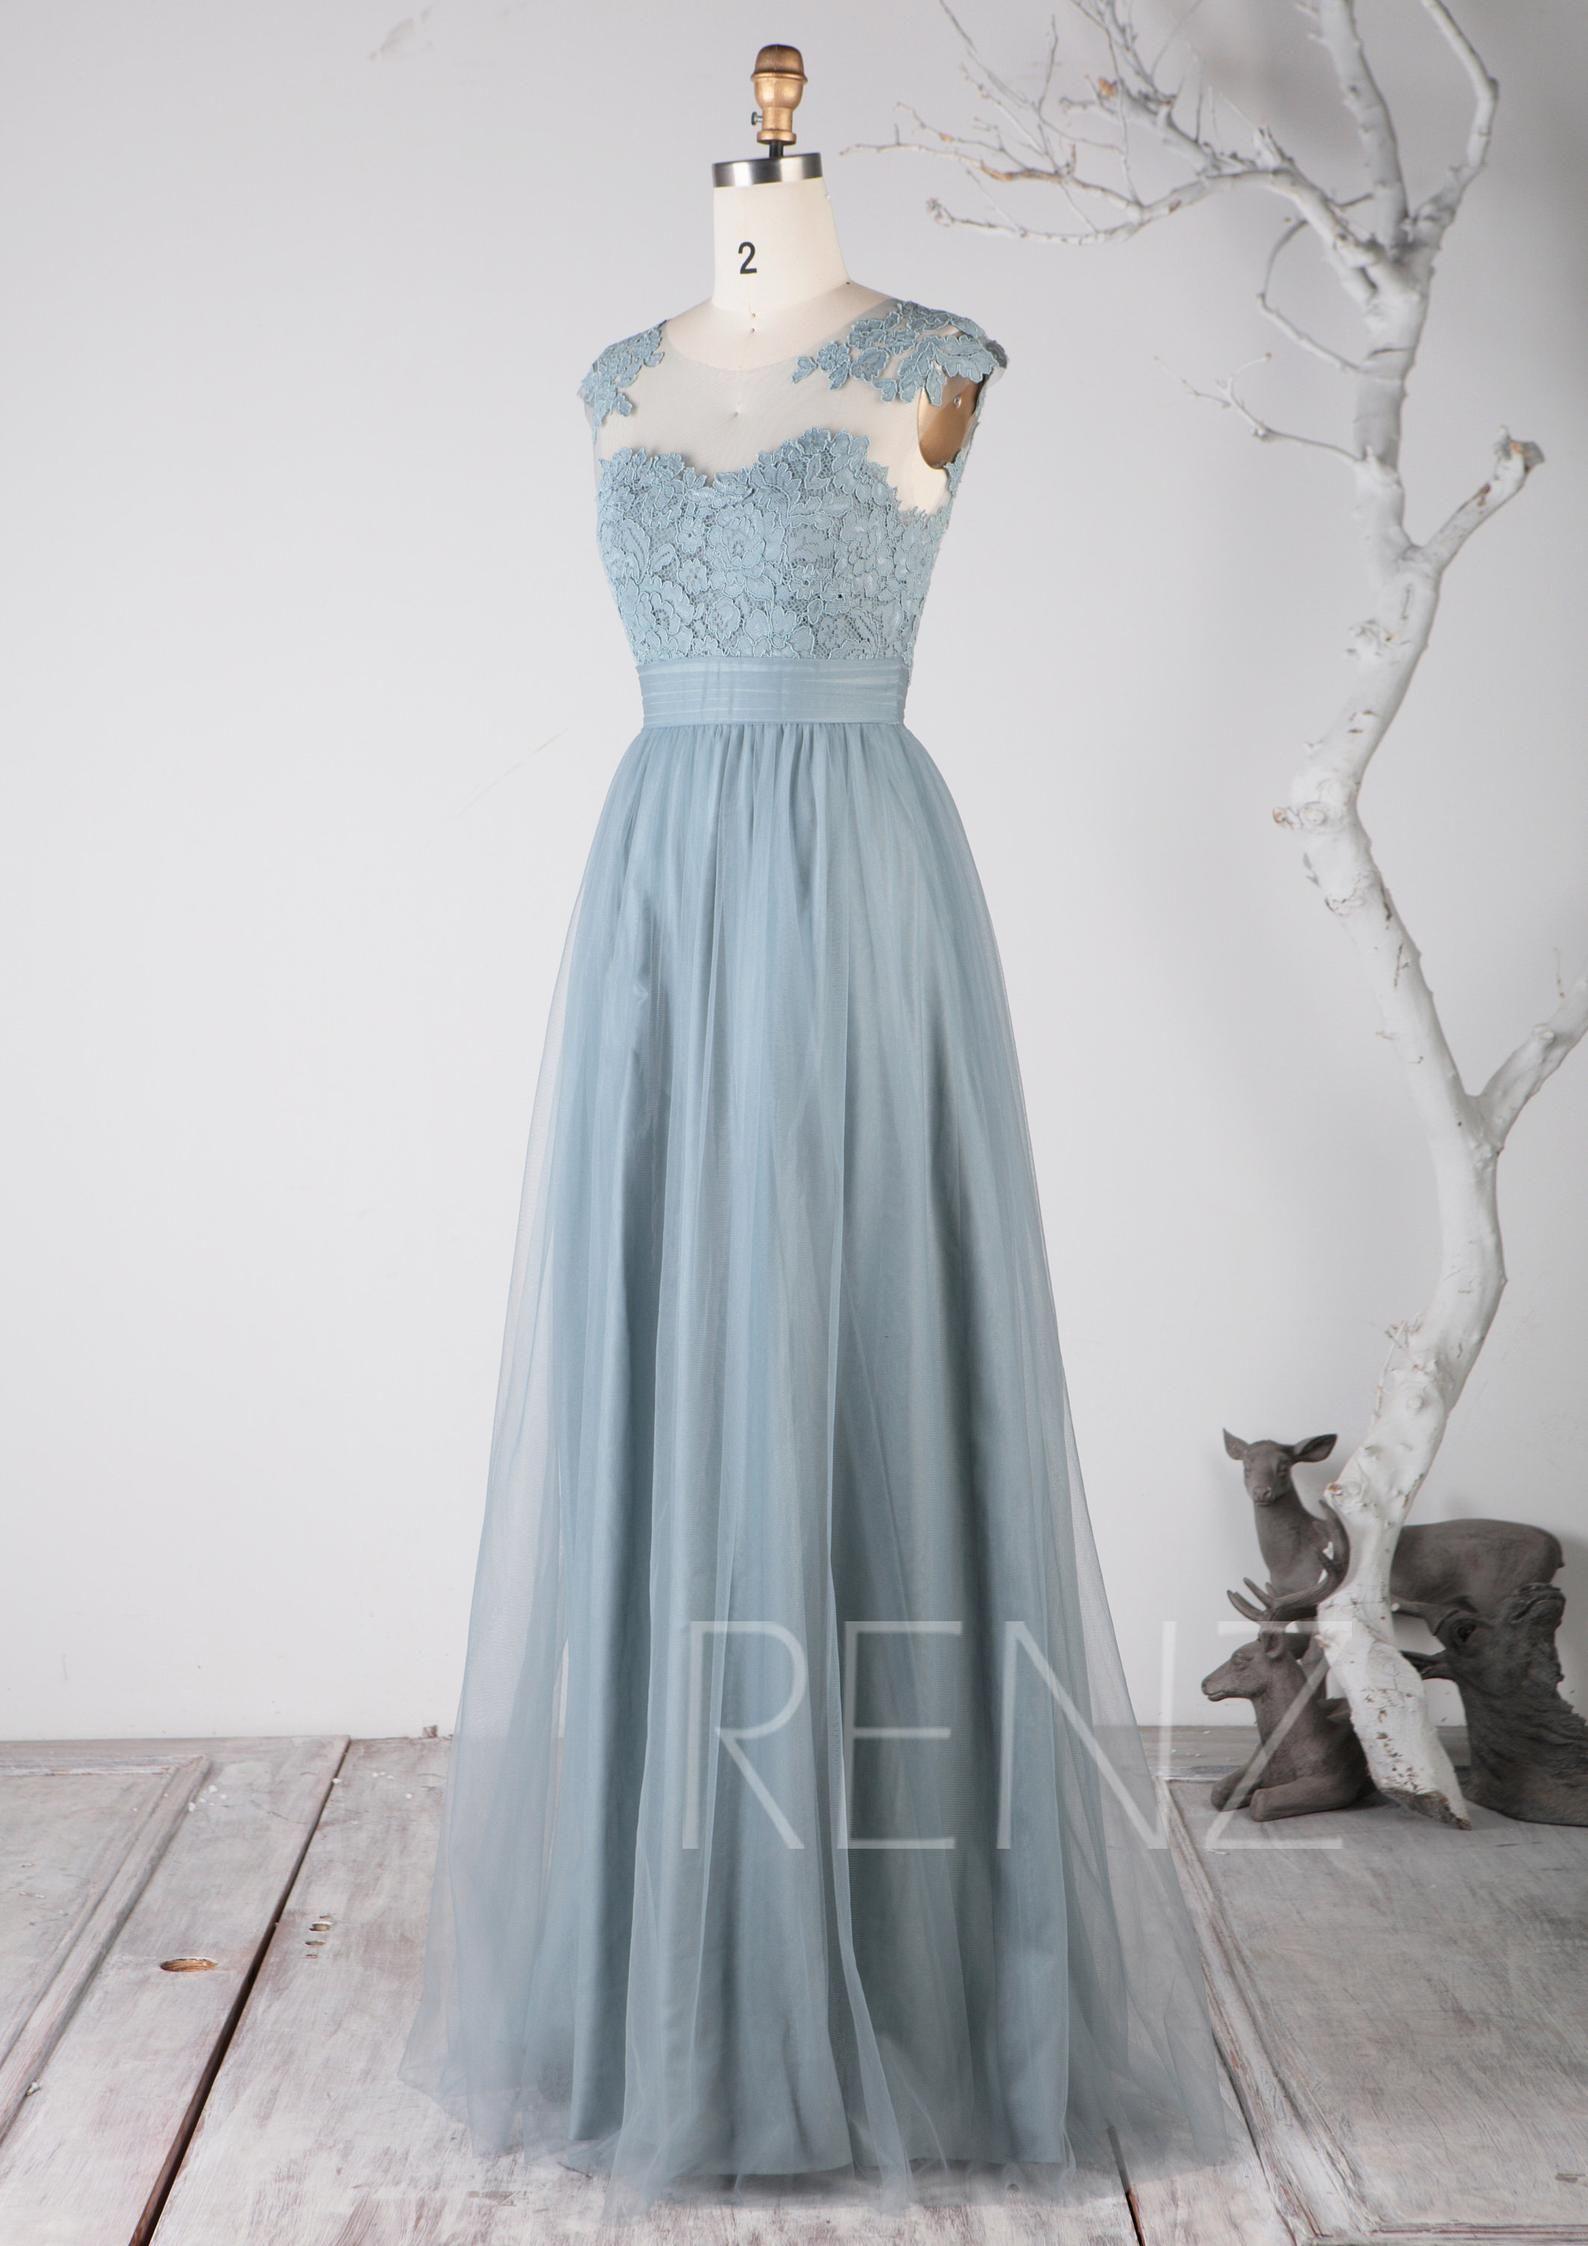 Prom Dress Dusty Blue Tulle Bridesmaid Dress Illusion Lace Etsy Tulle Bridesmaid Dress Dresses Nice Dresses [ 2246 x 1588 Pixel ]